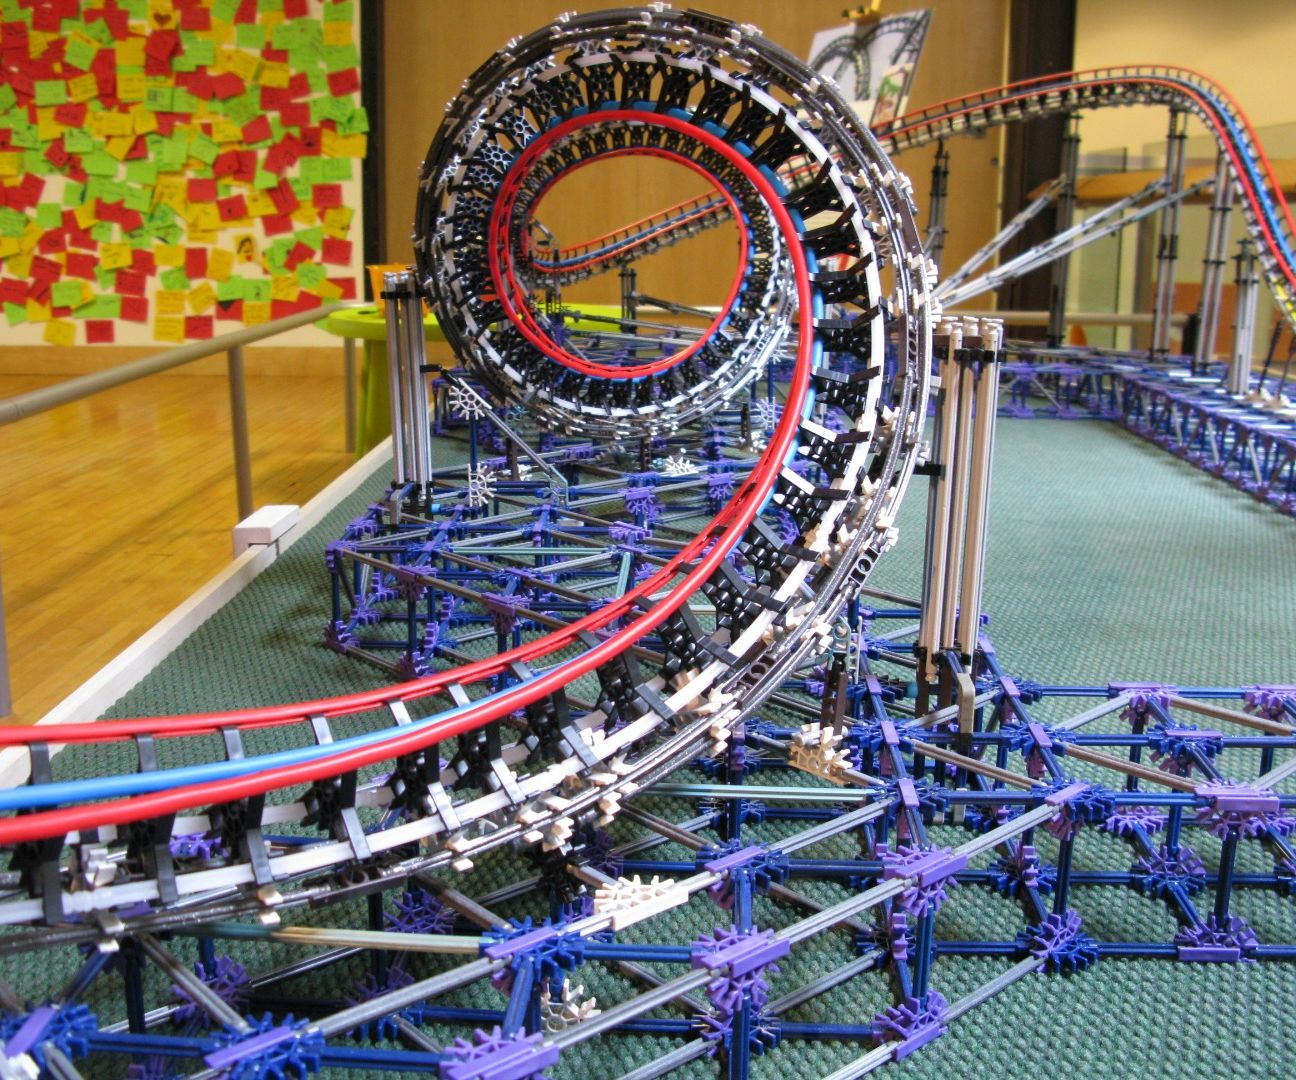 Dragon Fire - K'nex model roller coaster